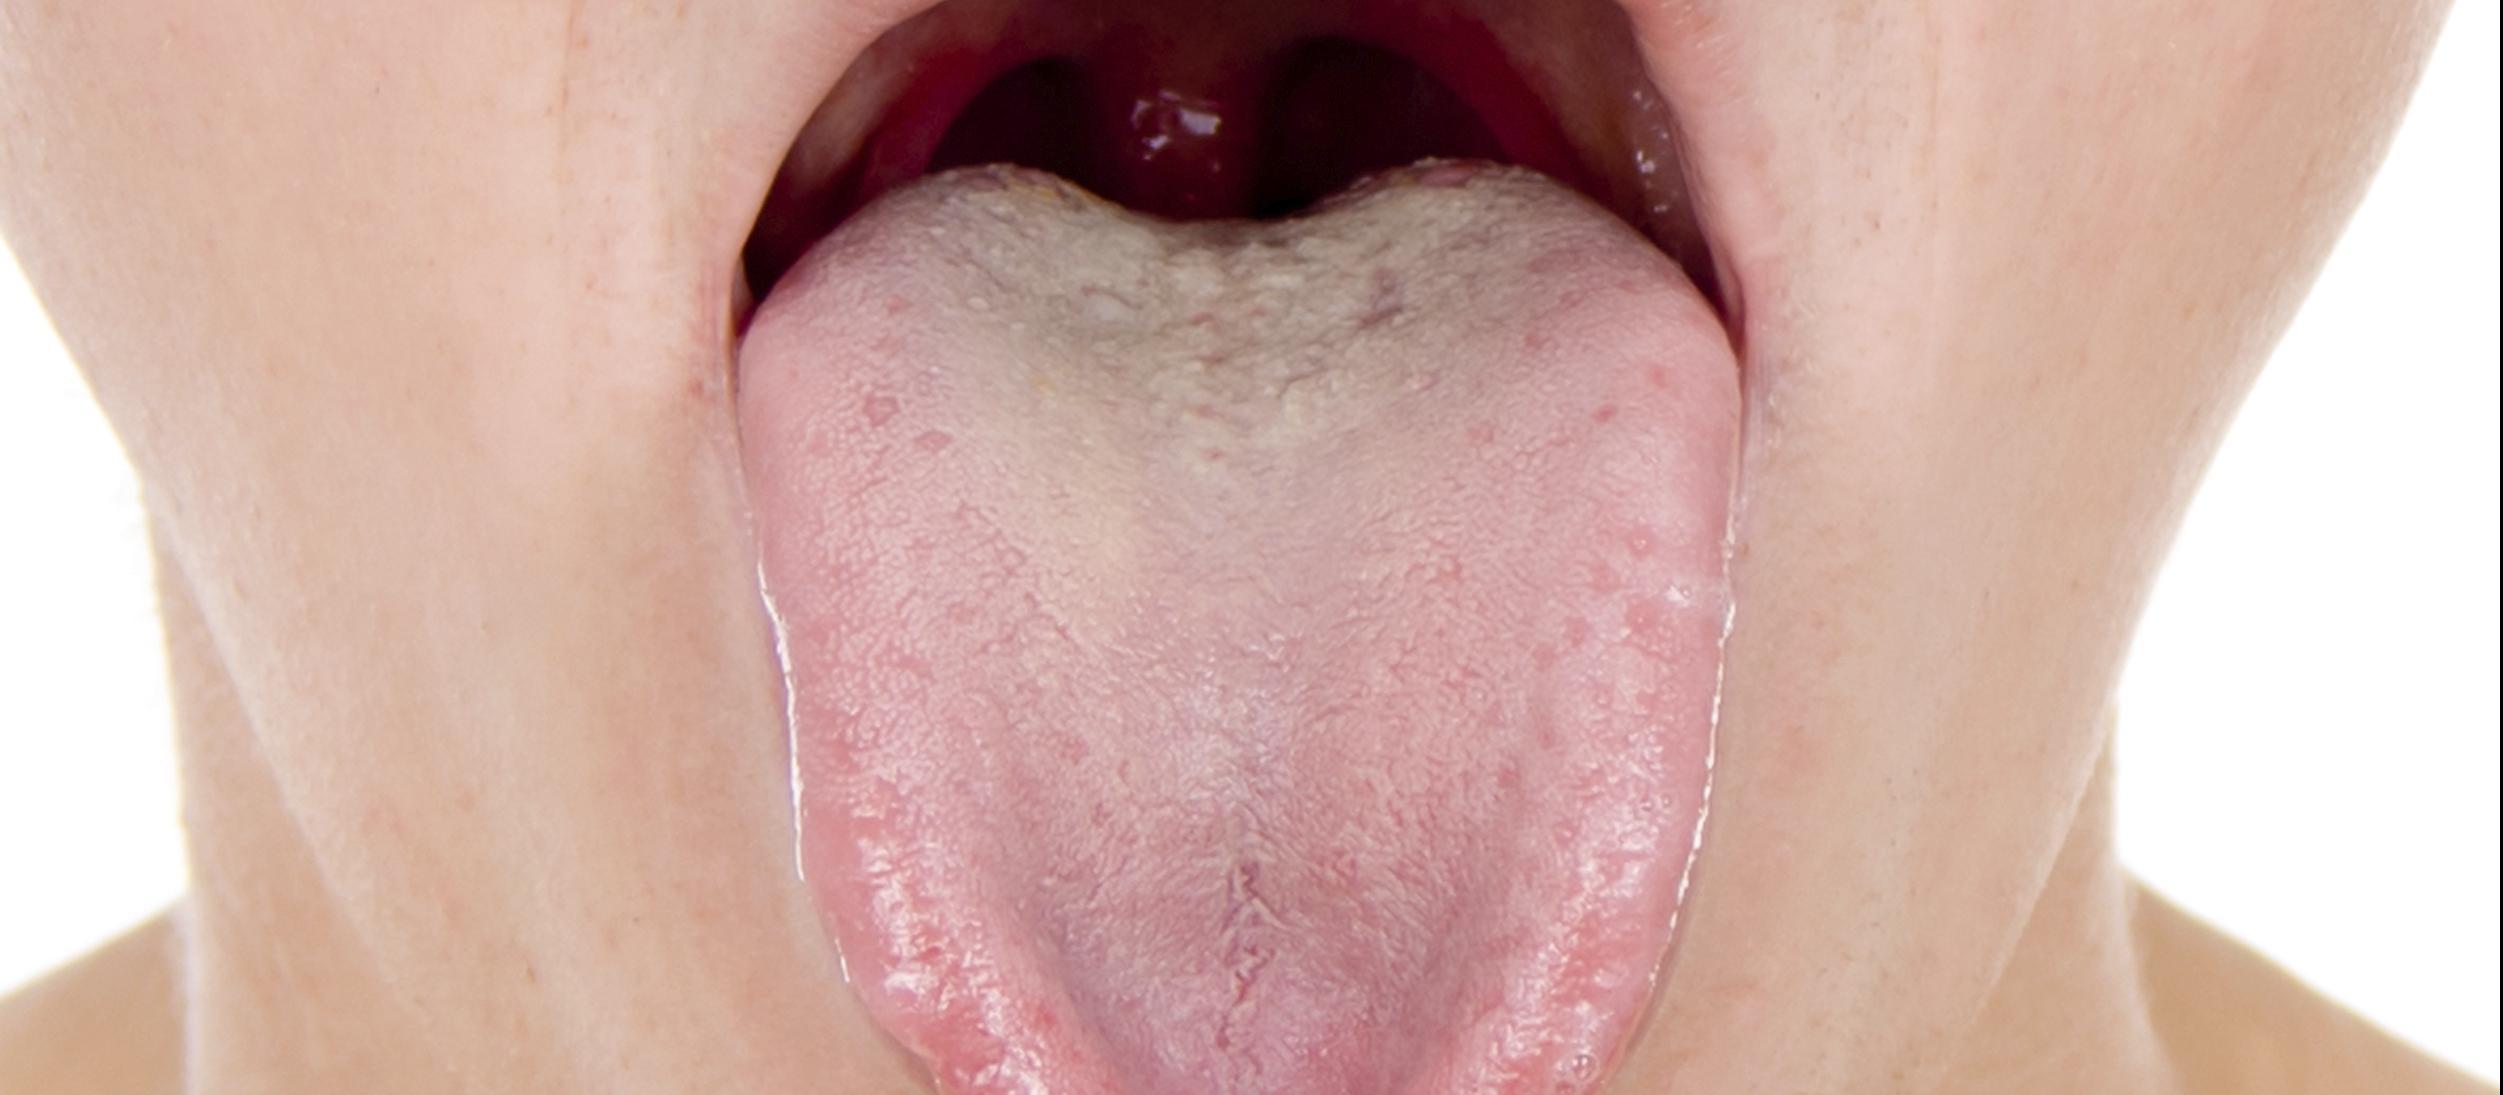 When a sore throat turns into meningitis | New Zealand Doctor